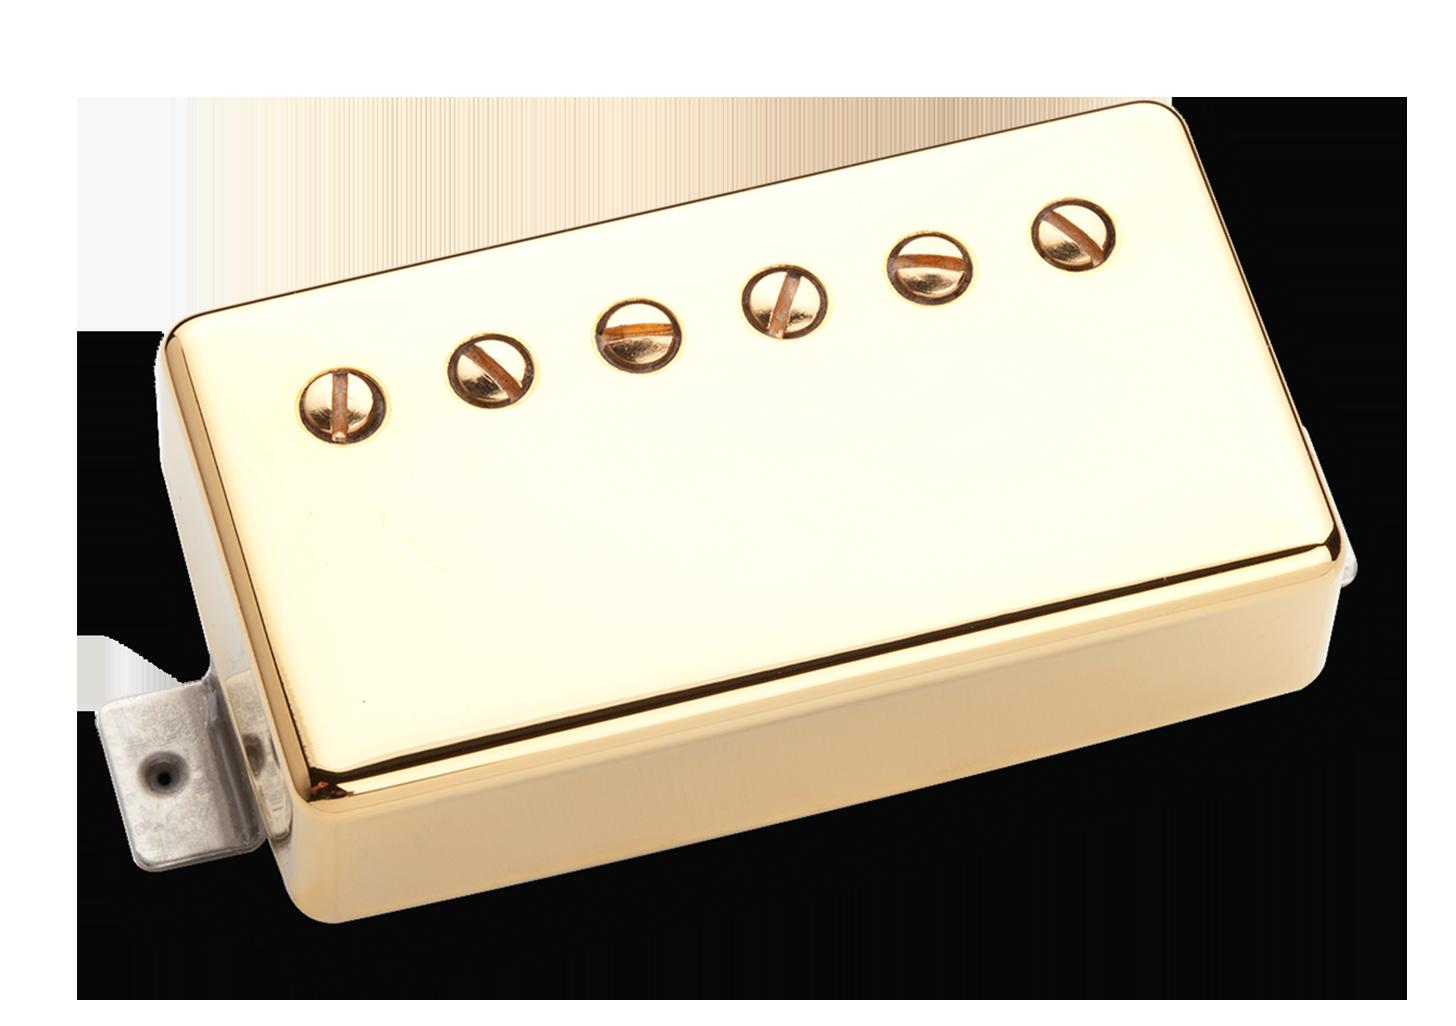 Seymour Duncan Jazz Humbucker - SH-2N Neck Gold